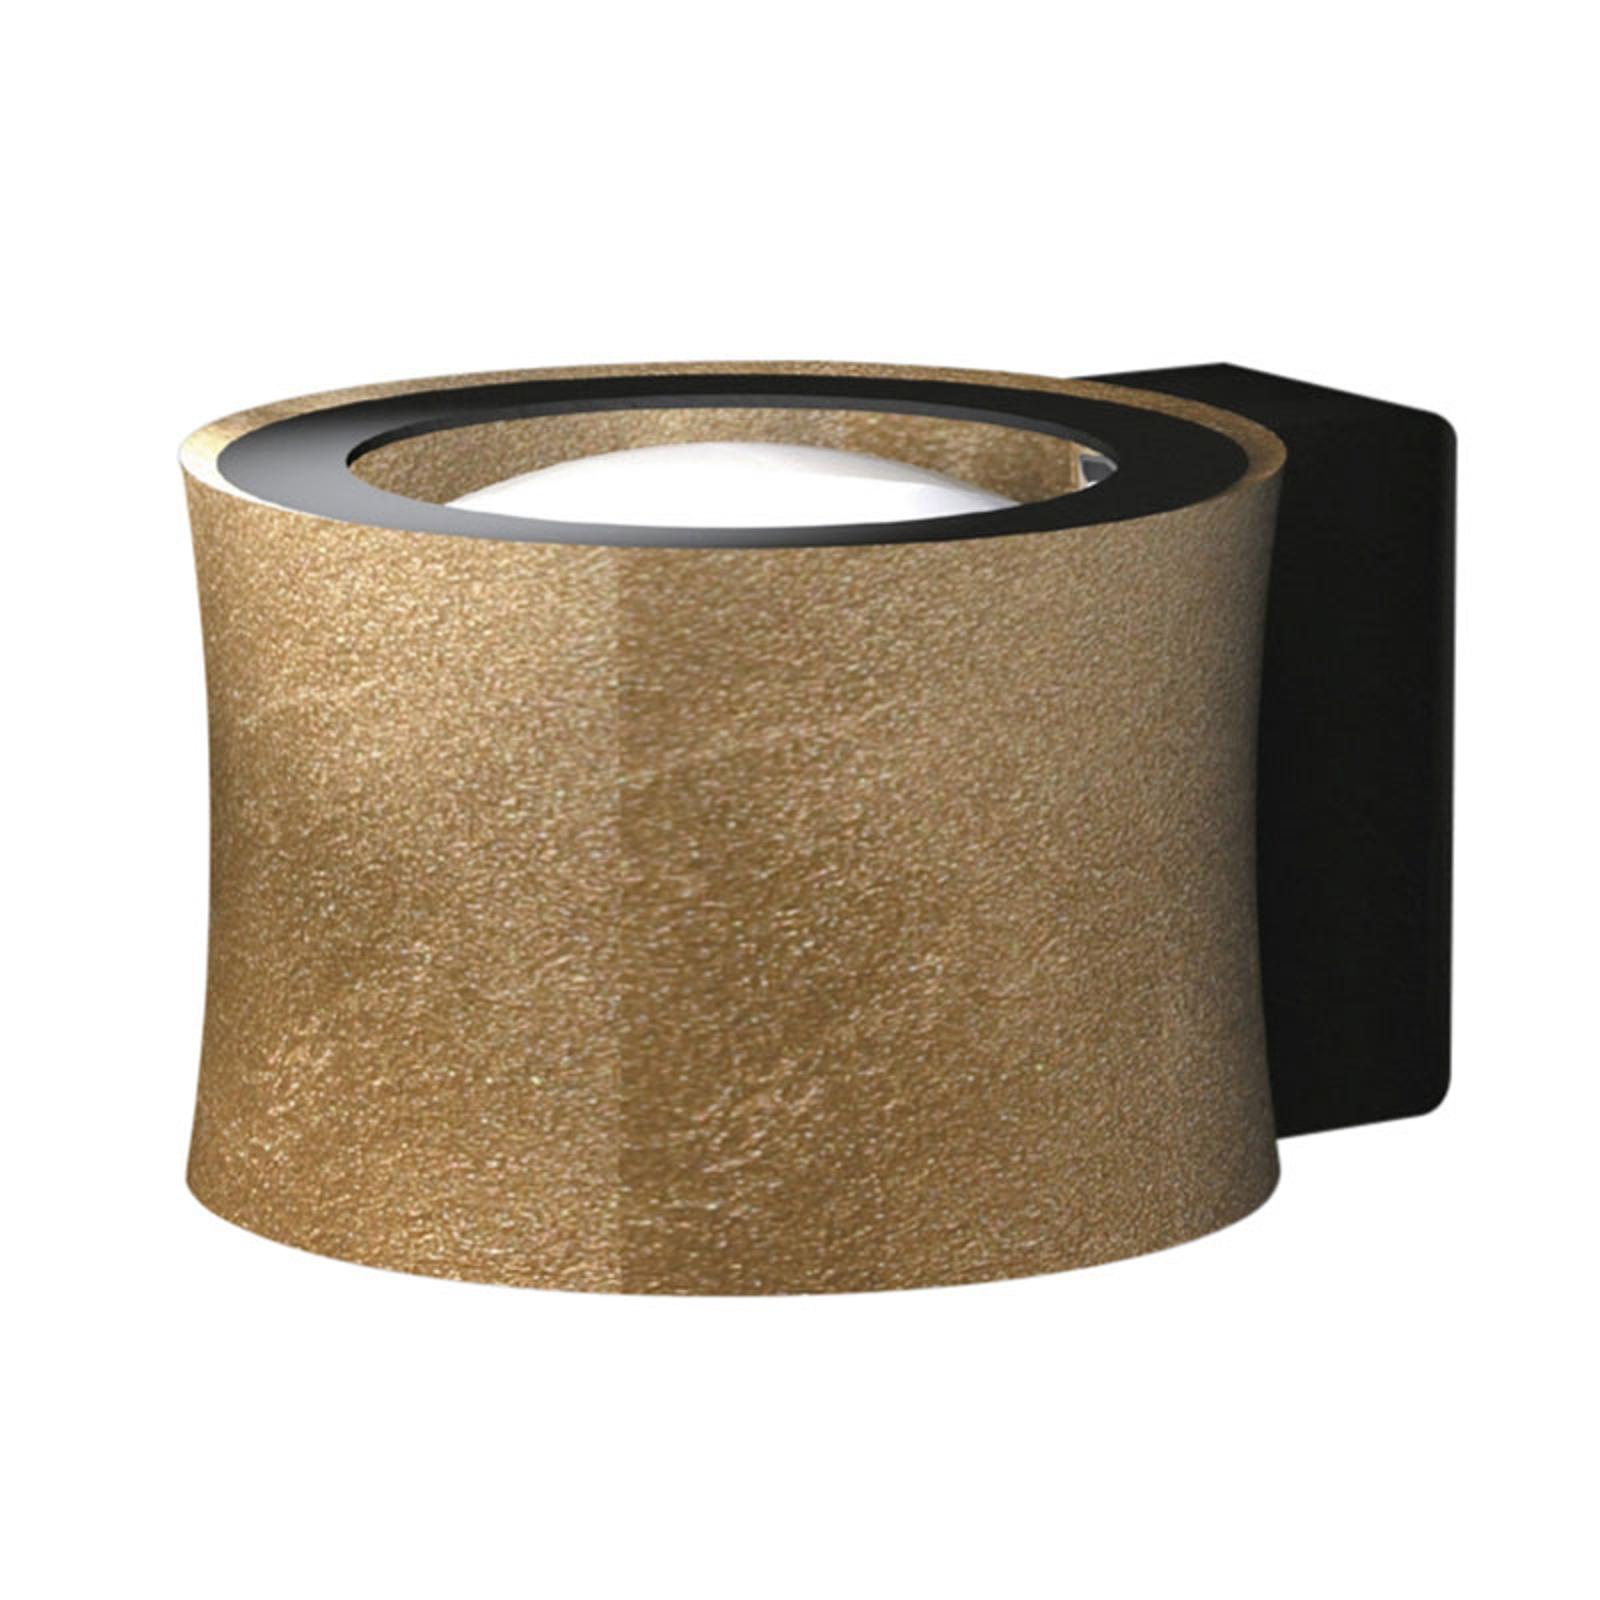 BANKAMP Impulse LED-Wandleuchte up/down gold